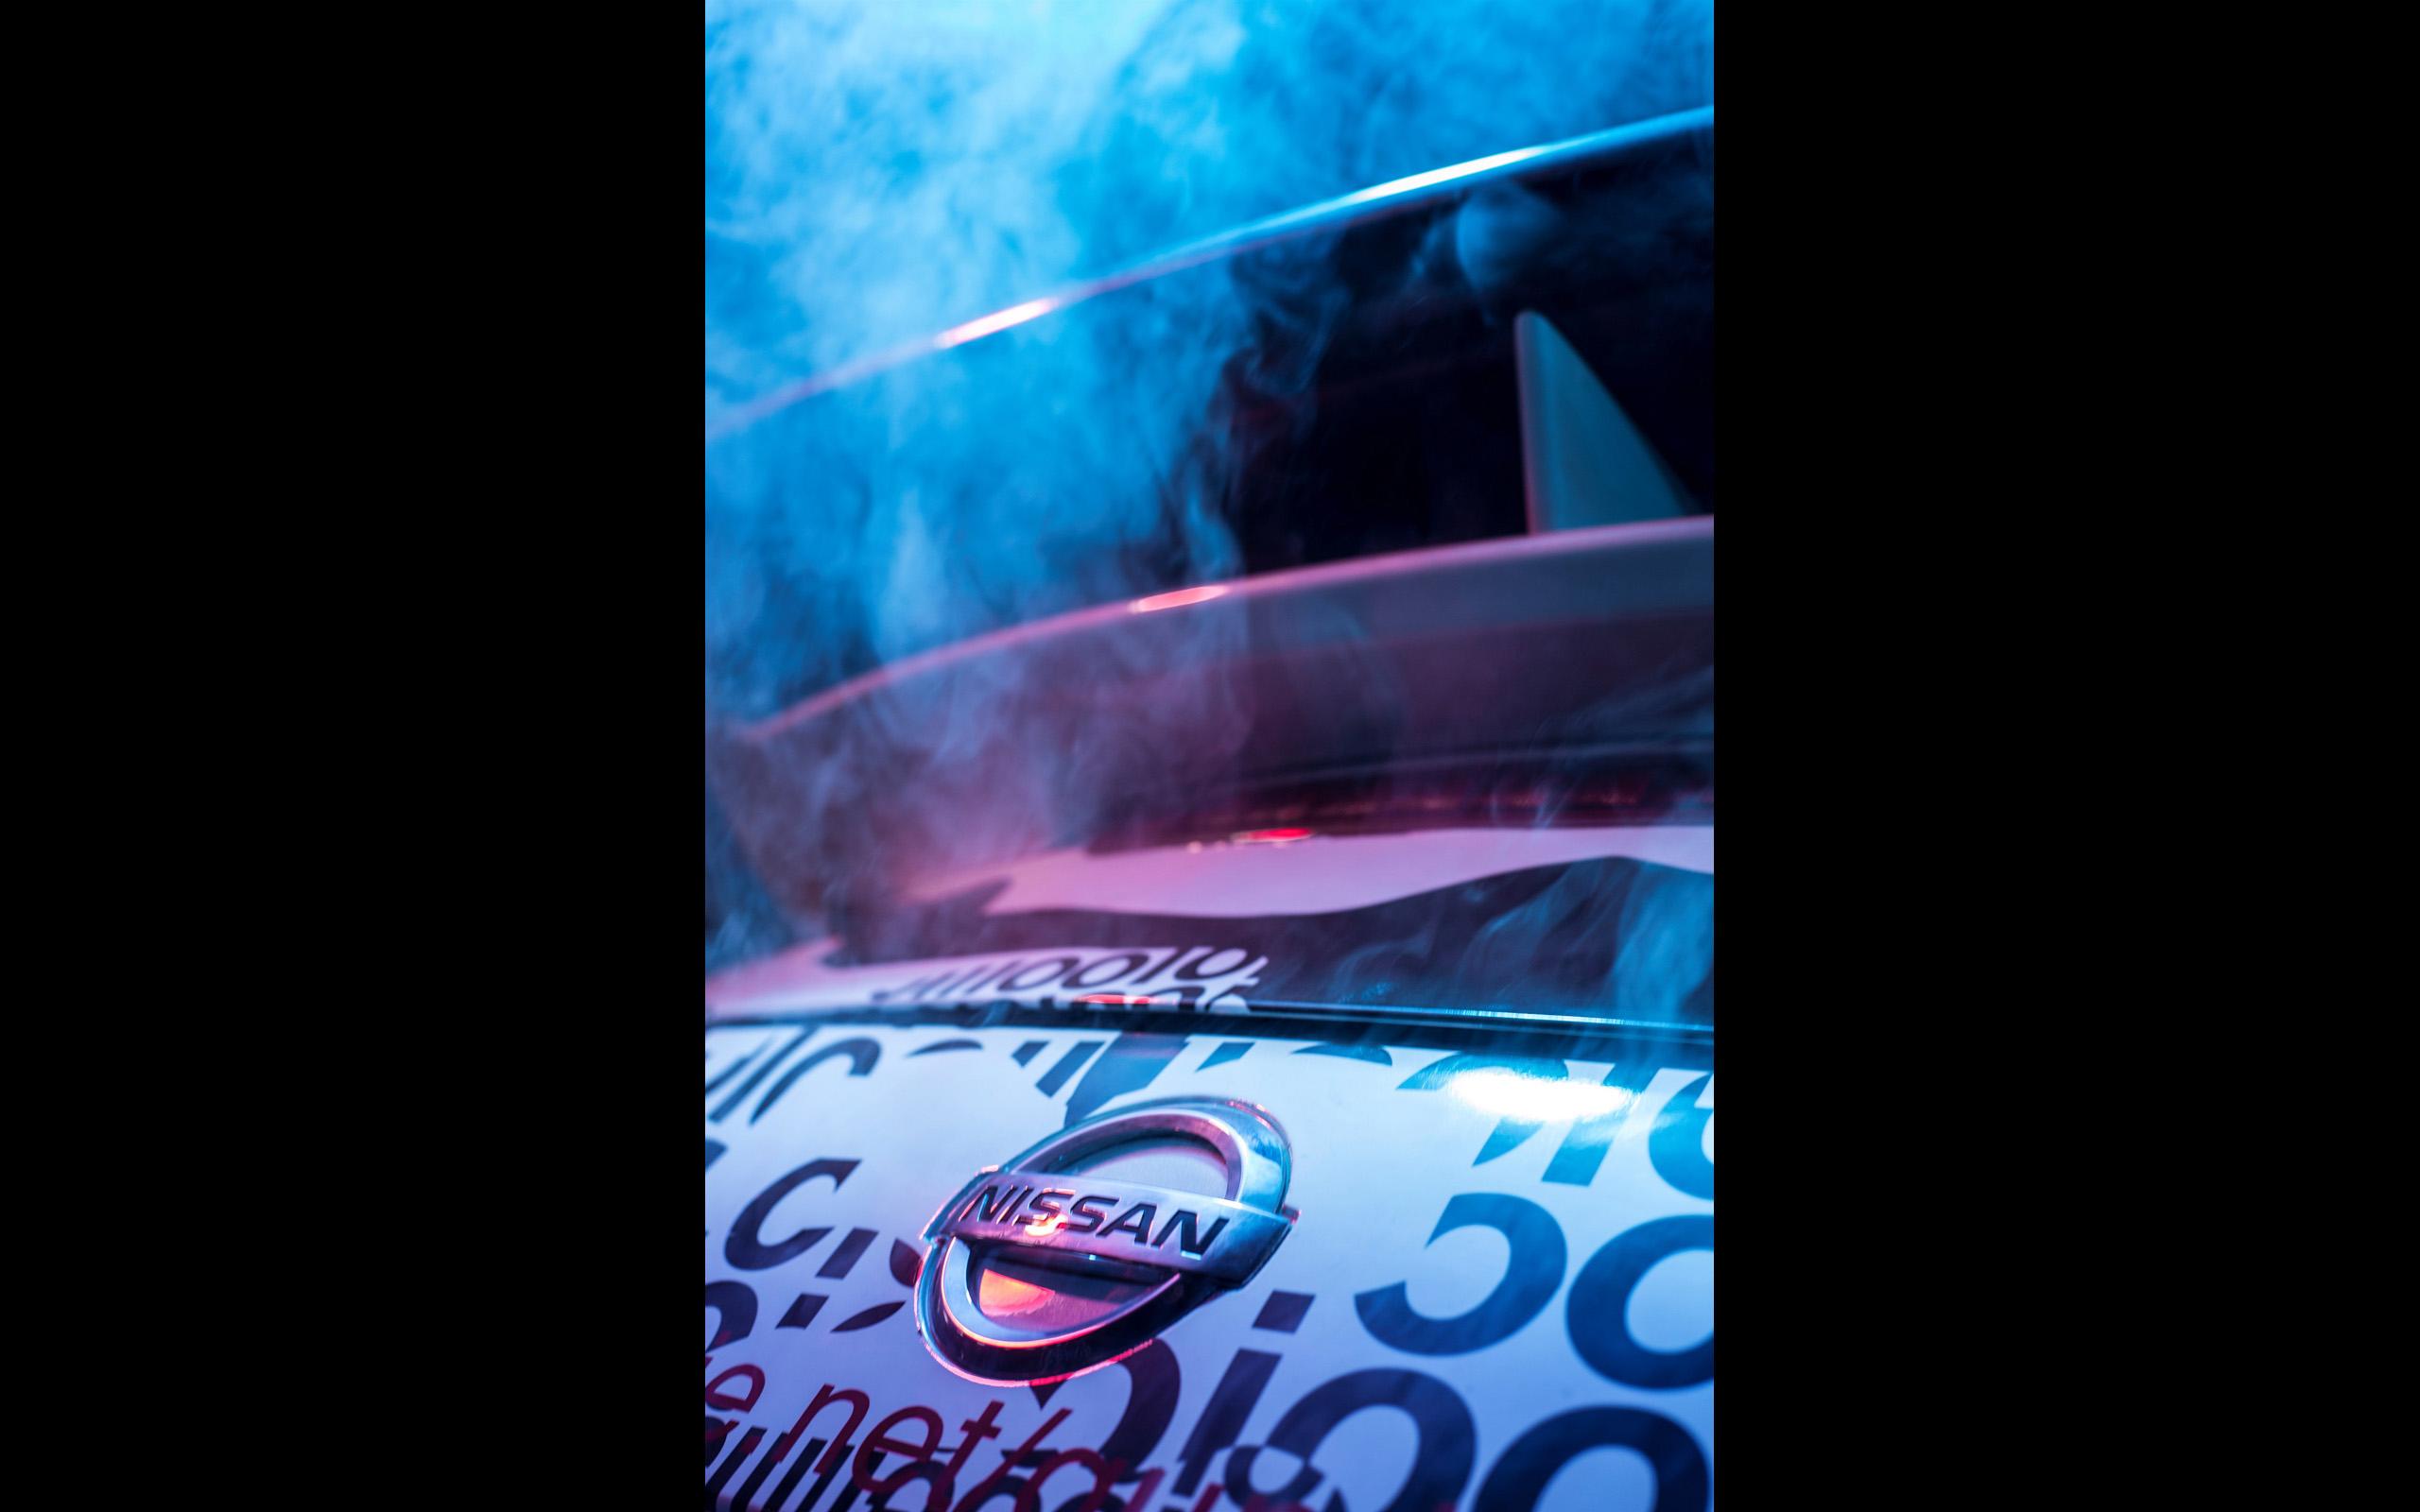 2013 nissan 370z nismo gumball 3000 rally autopik 2013 nissan 370z nismo gumball 3000 rally vanachro Choice Image